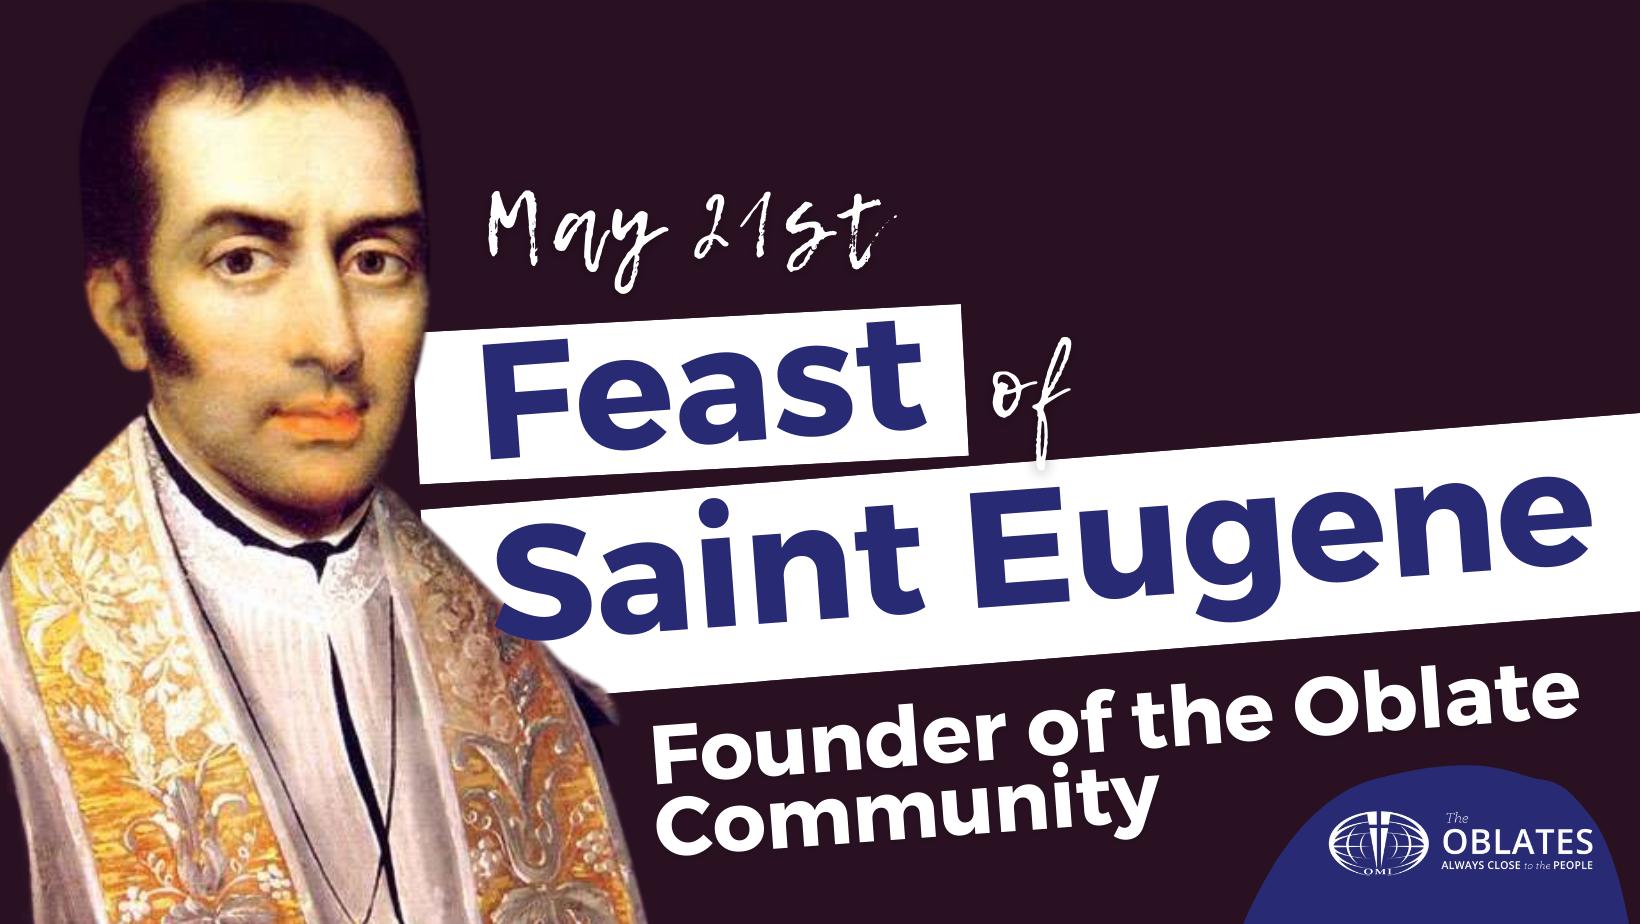 Feast of Saint Eugene May 21st